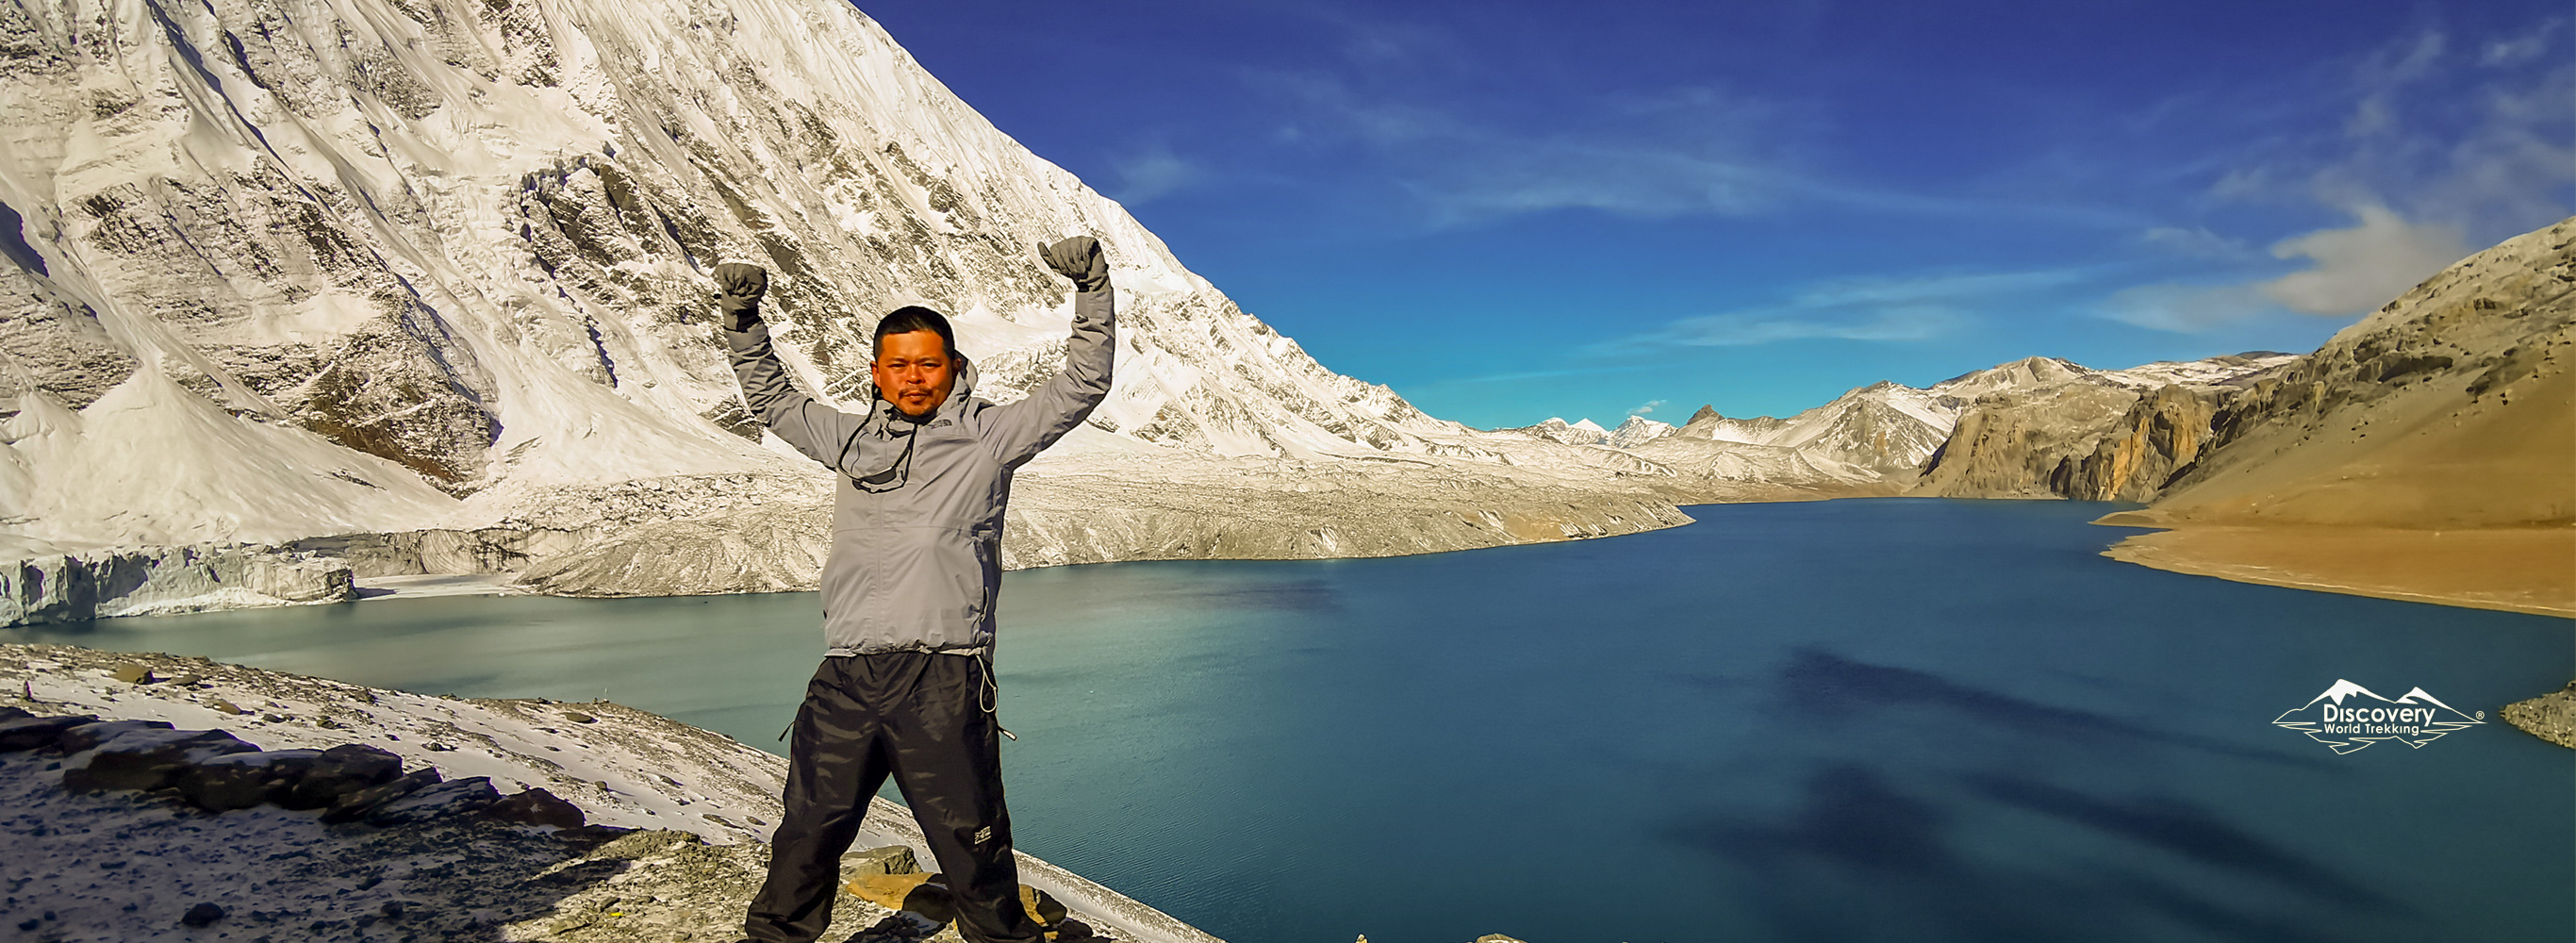 Annapurna Circuit Trek with Tilicho Lake - 16 Days